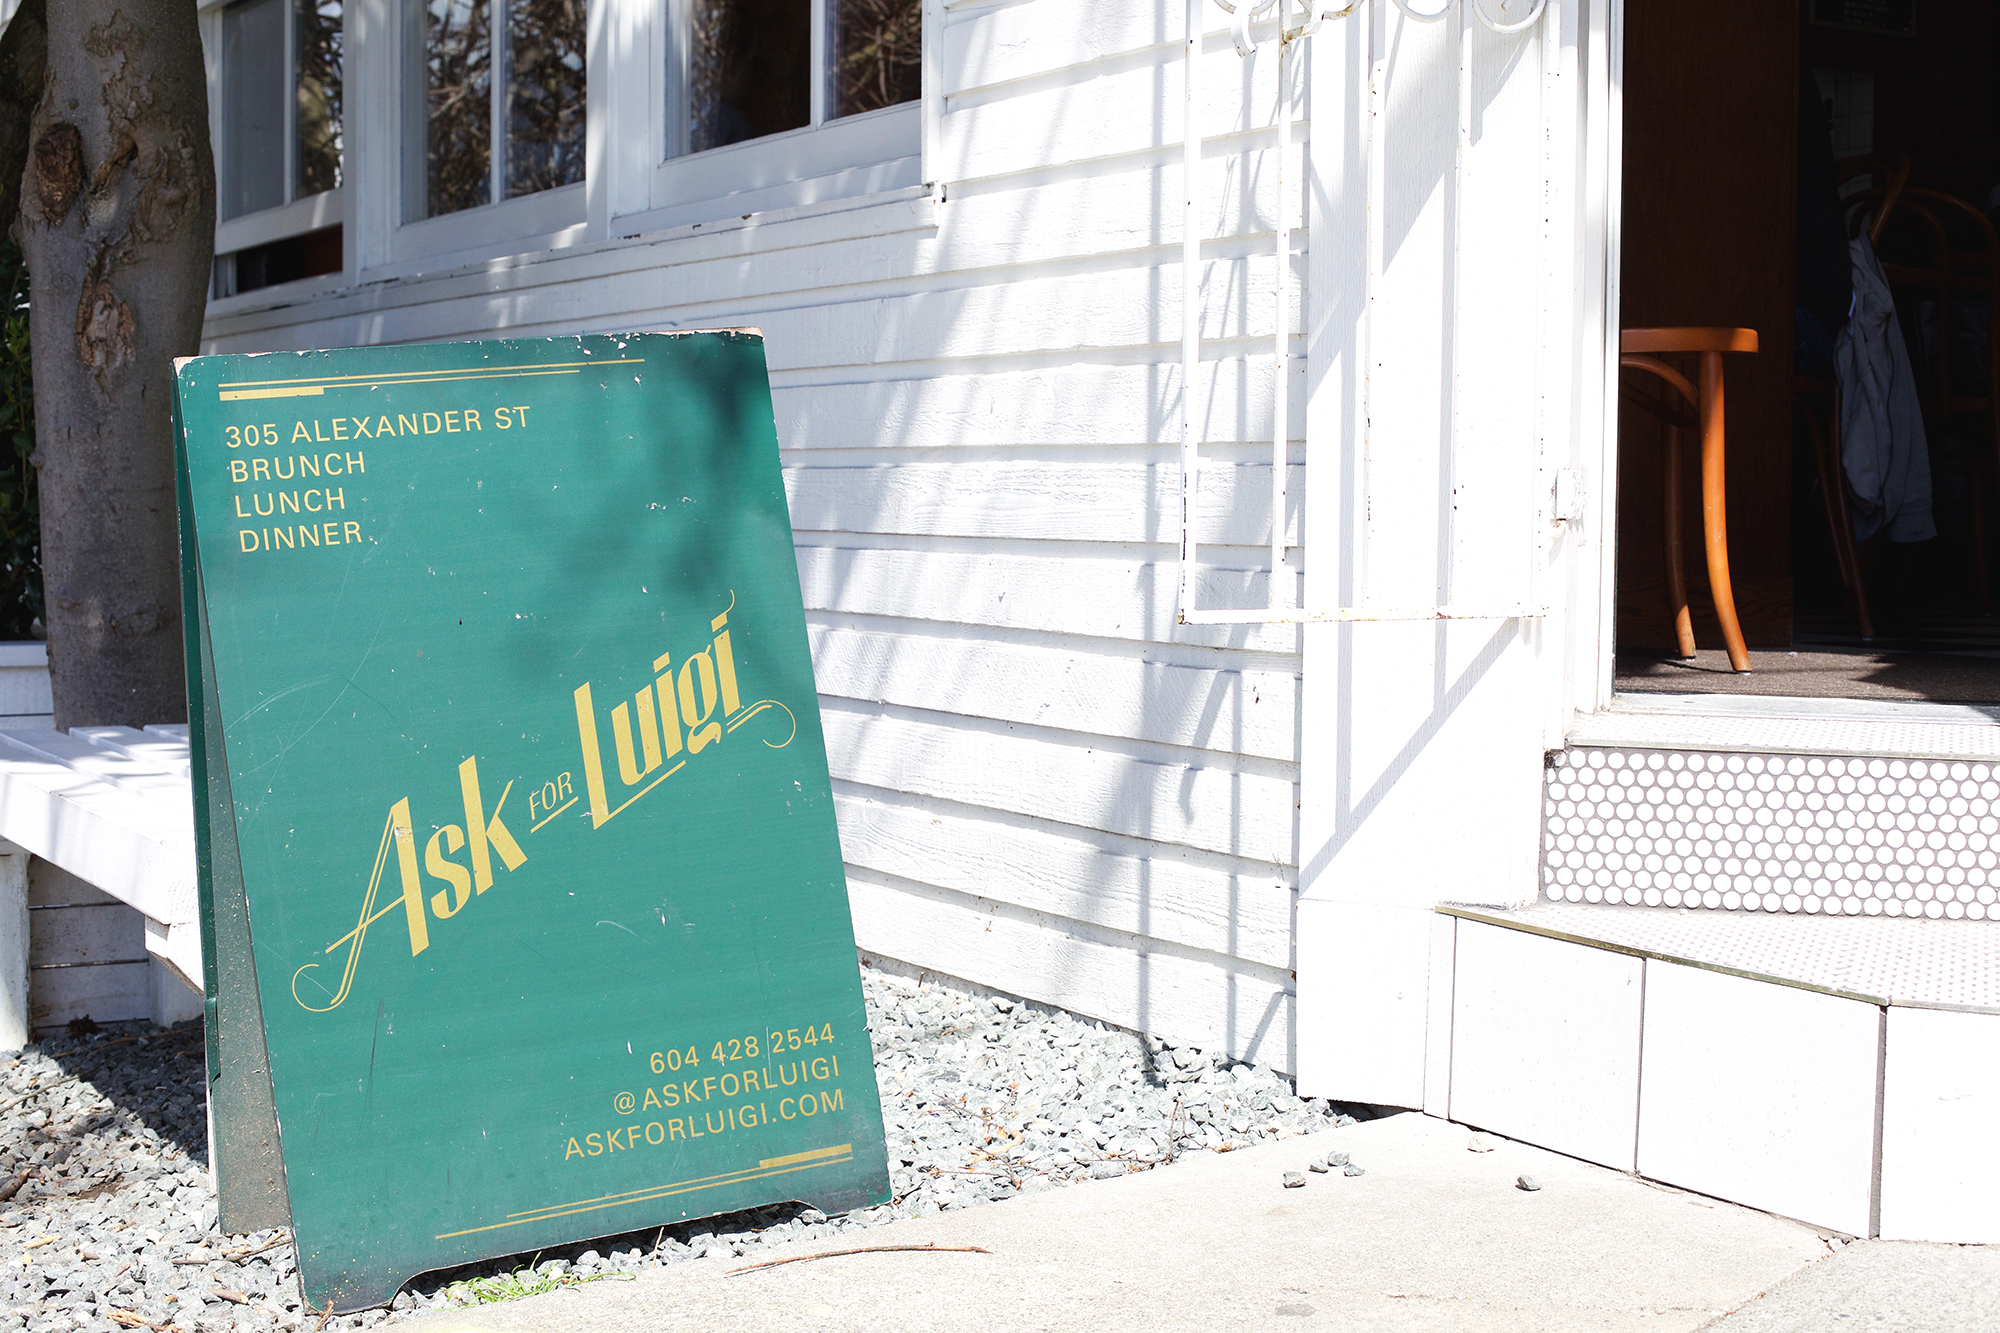 ASK FOR LUIGI